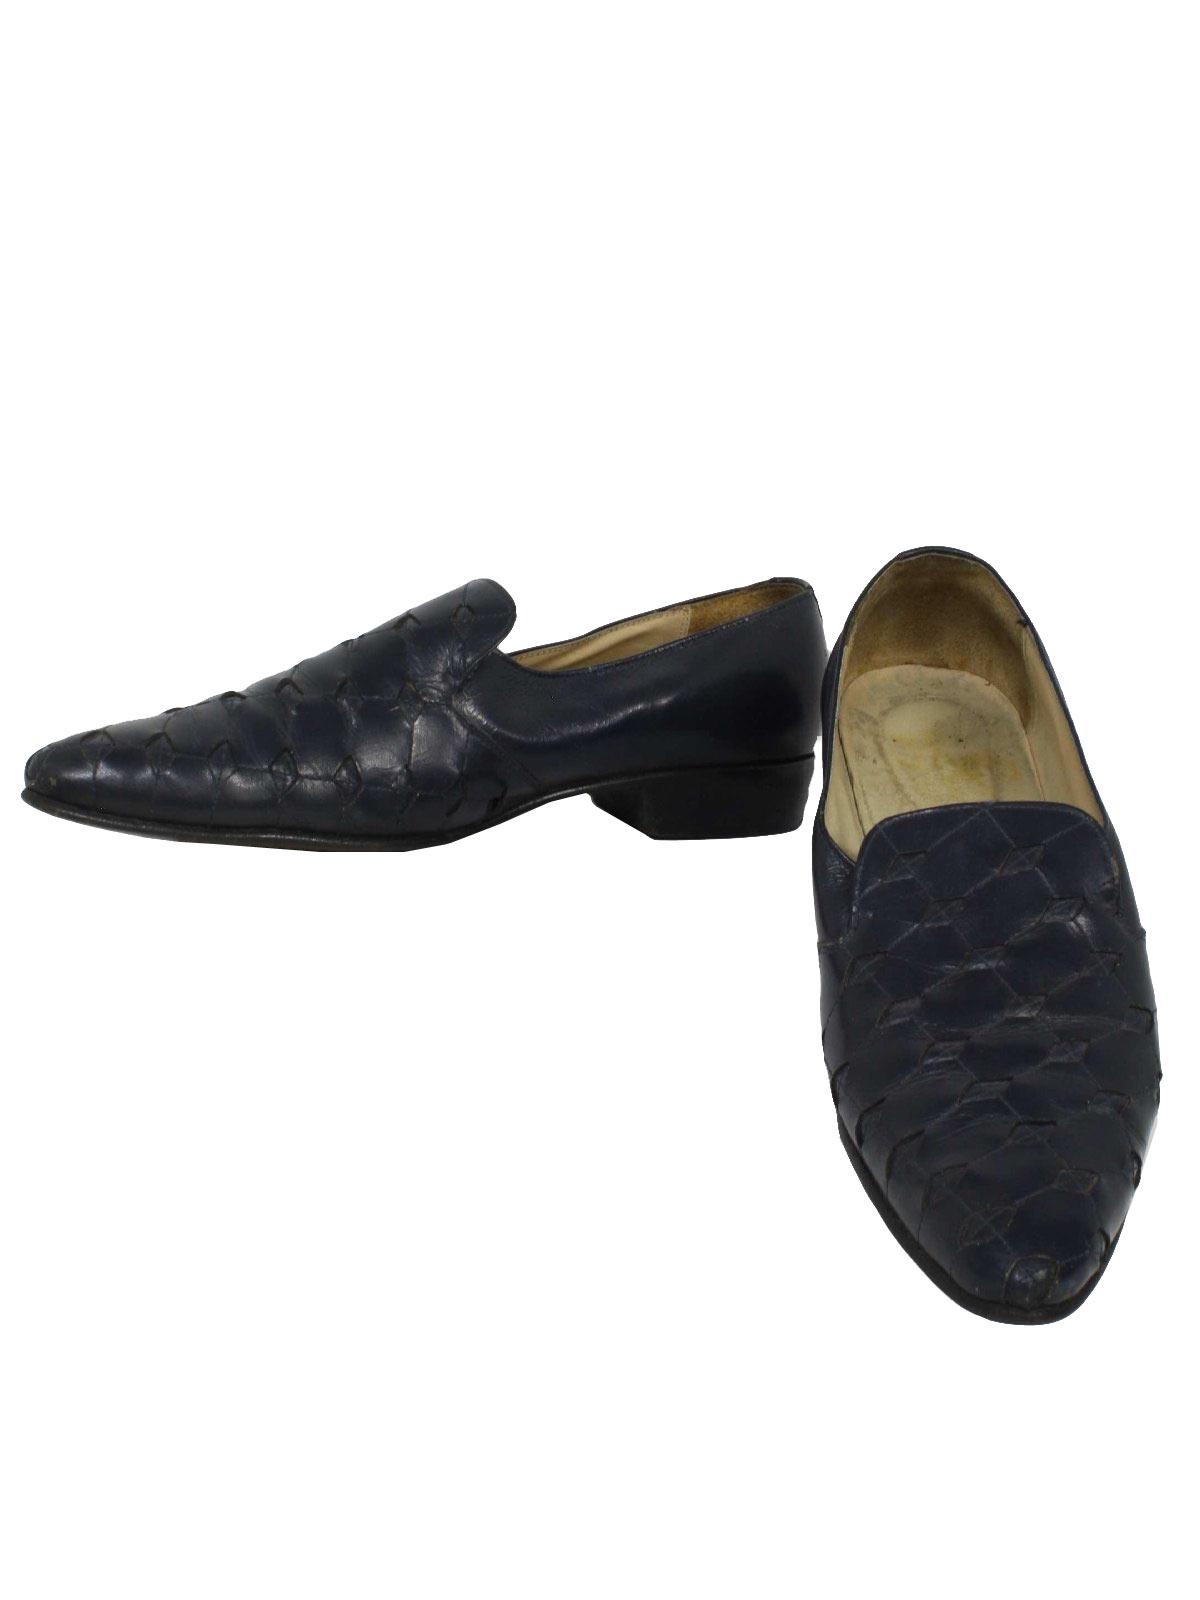 0de6cec362976 1980's Mens Leather Totally 80s Loafer Disco Pimp Shoes